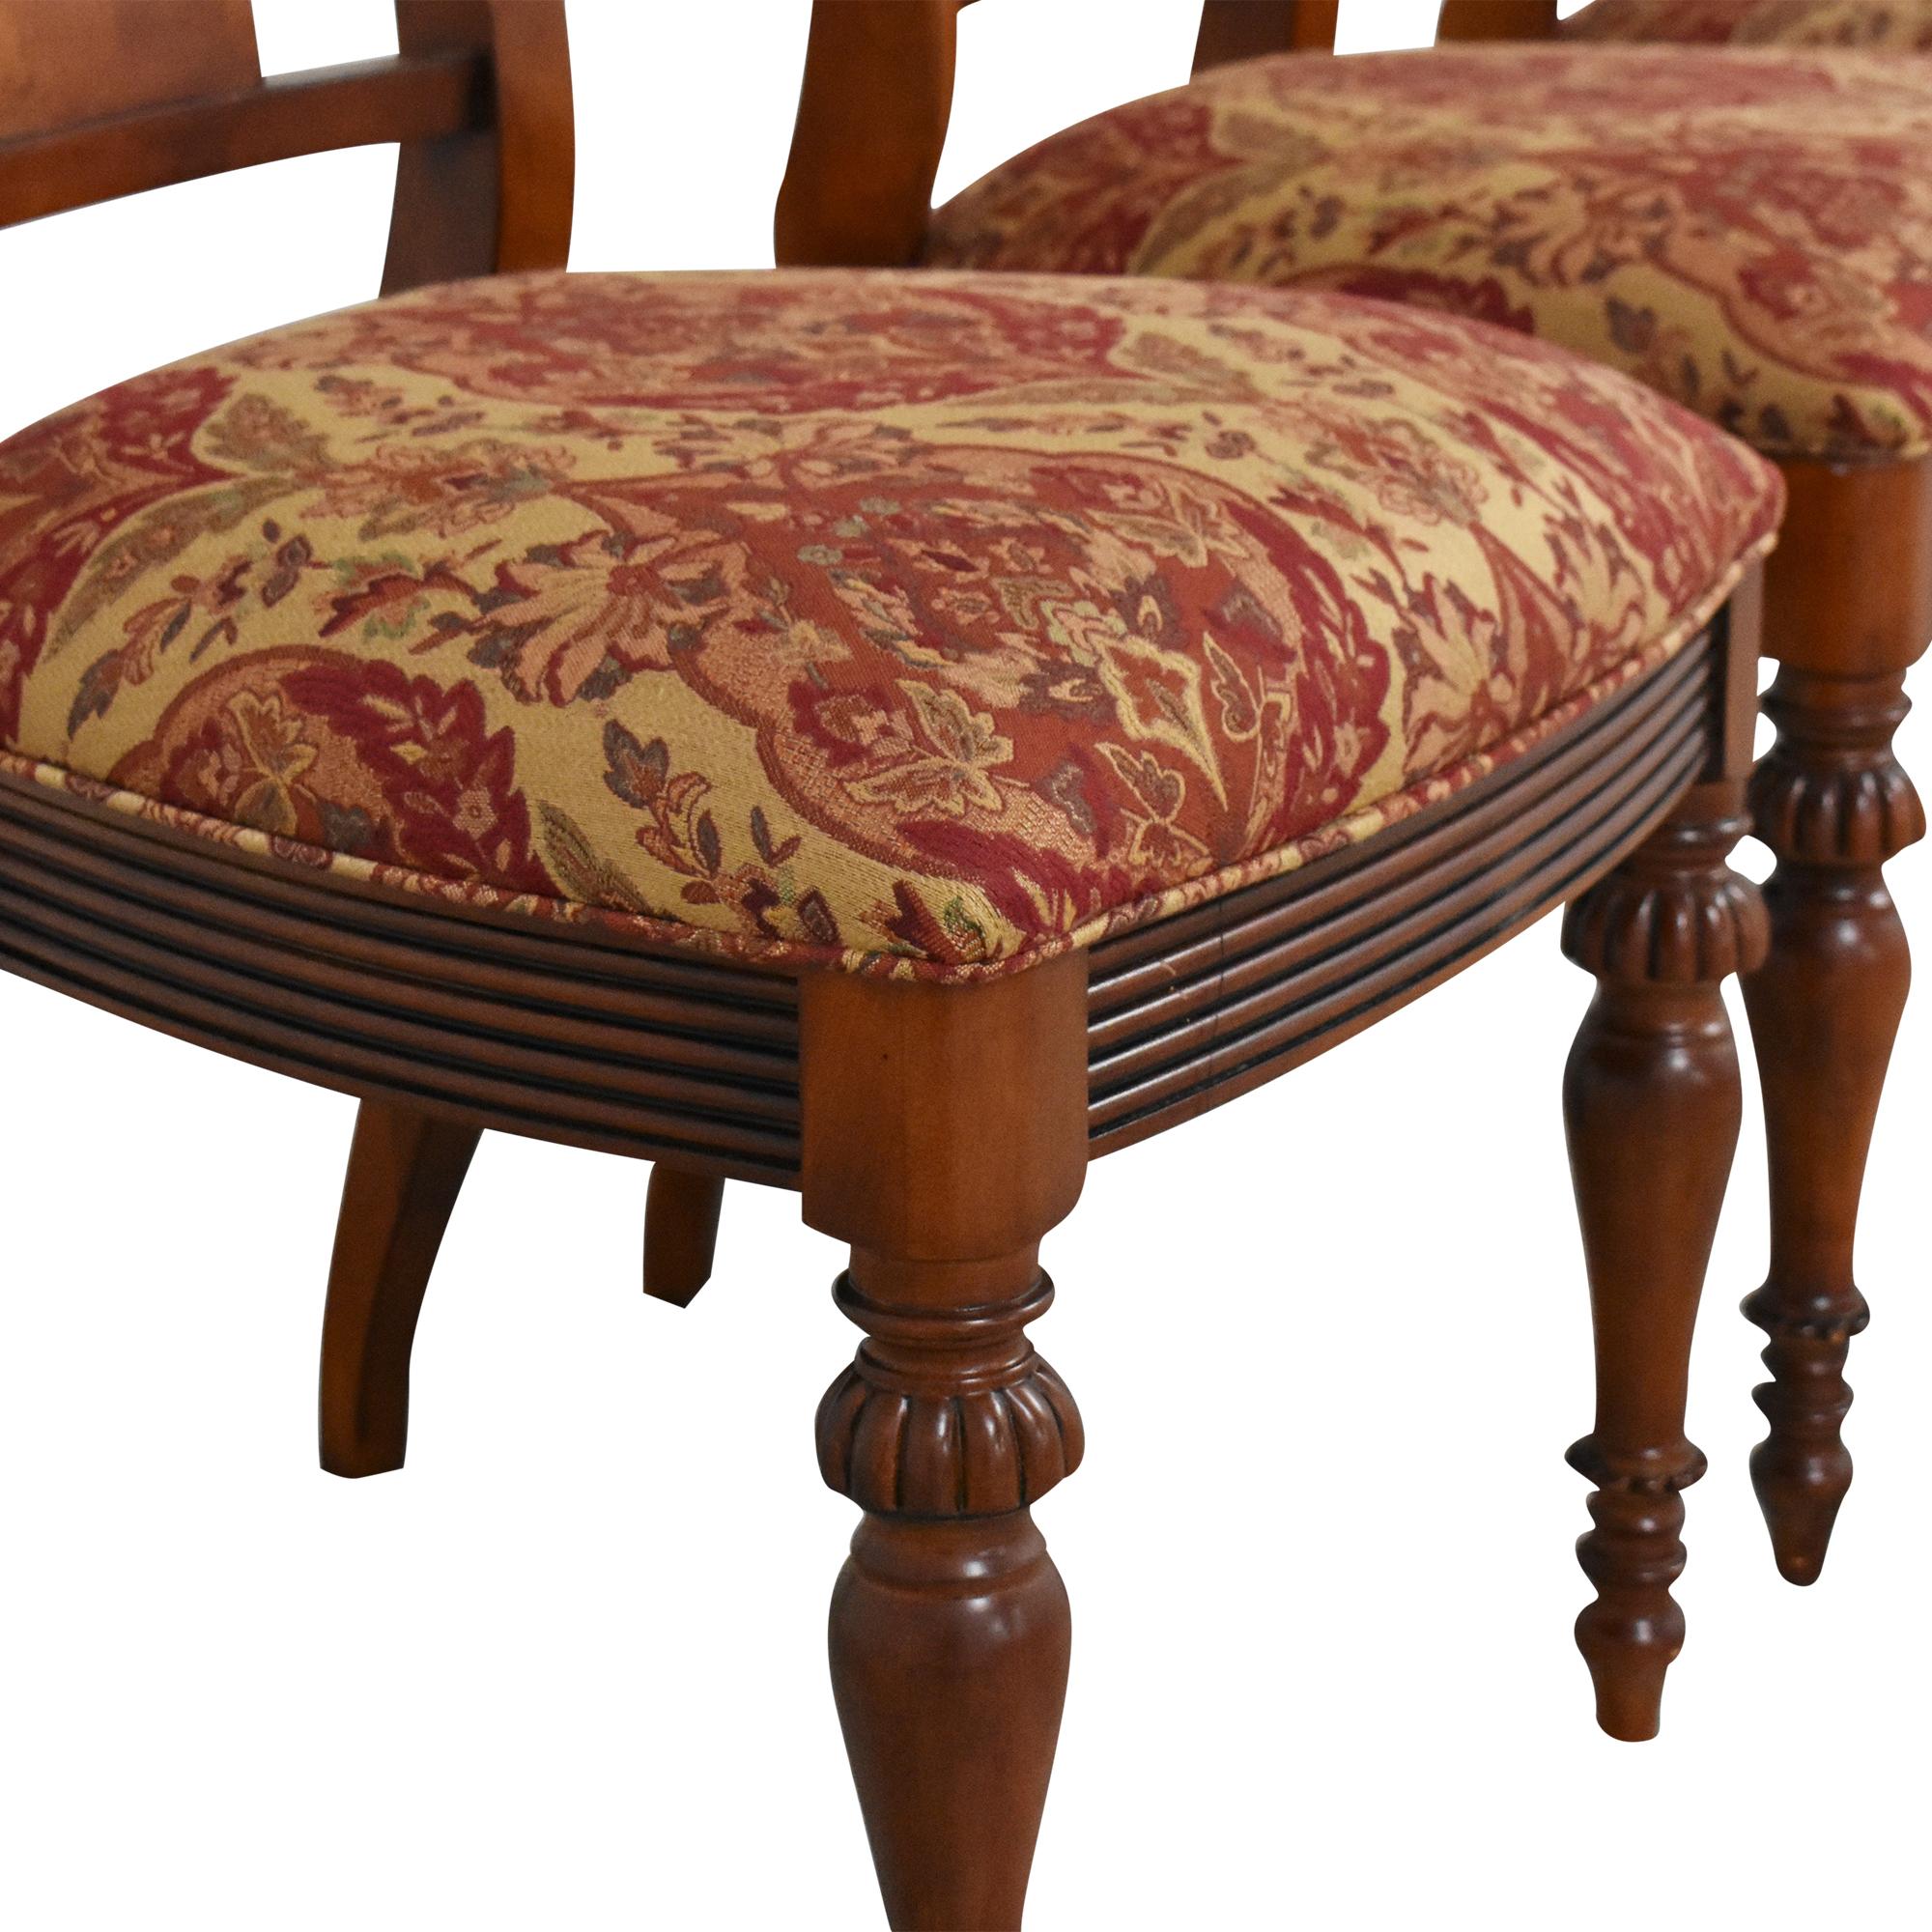 Ethan Allen Ethan Allen British Classic Splatback Dining Chairs